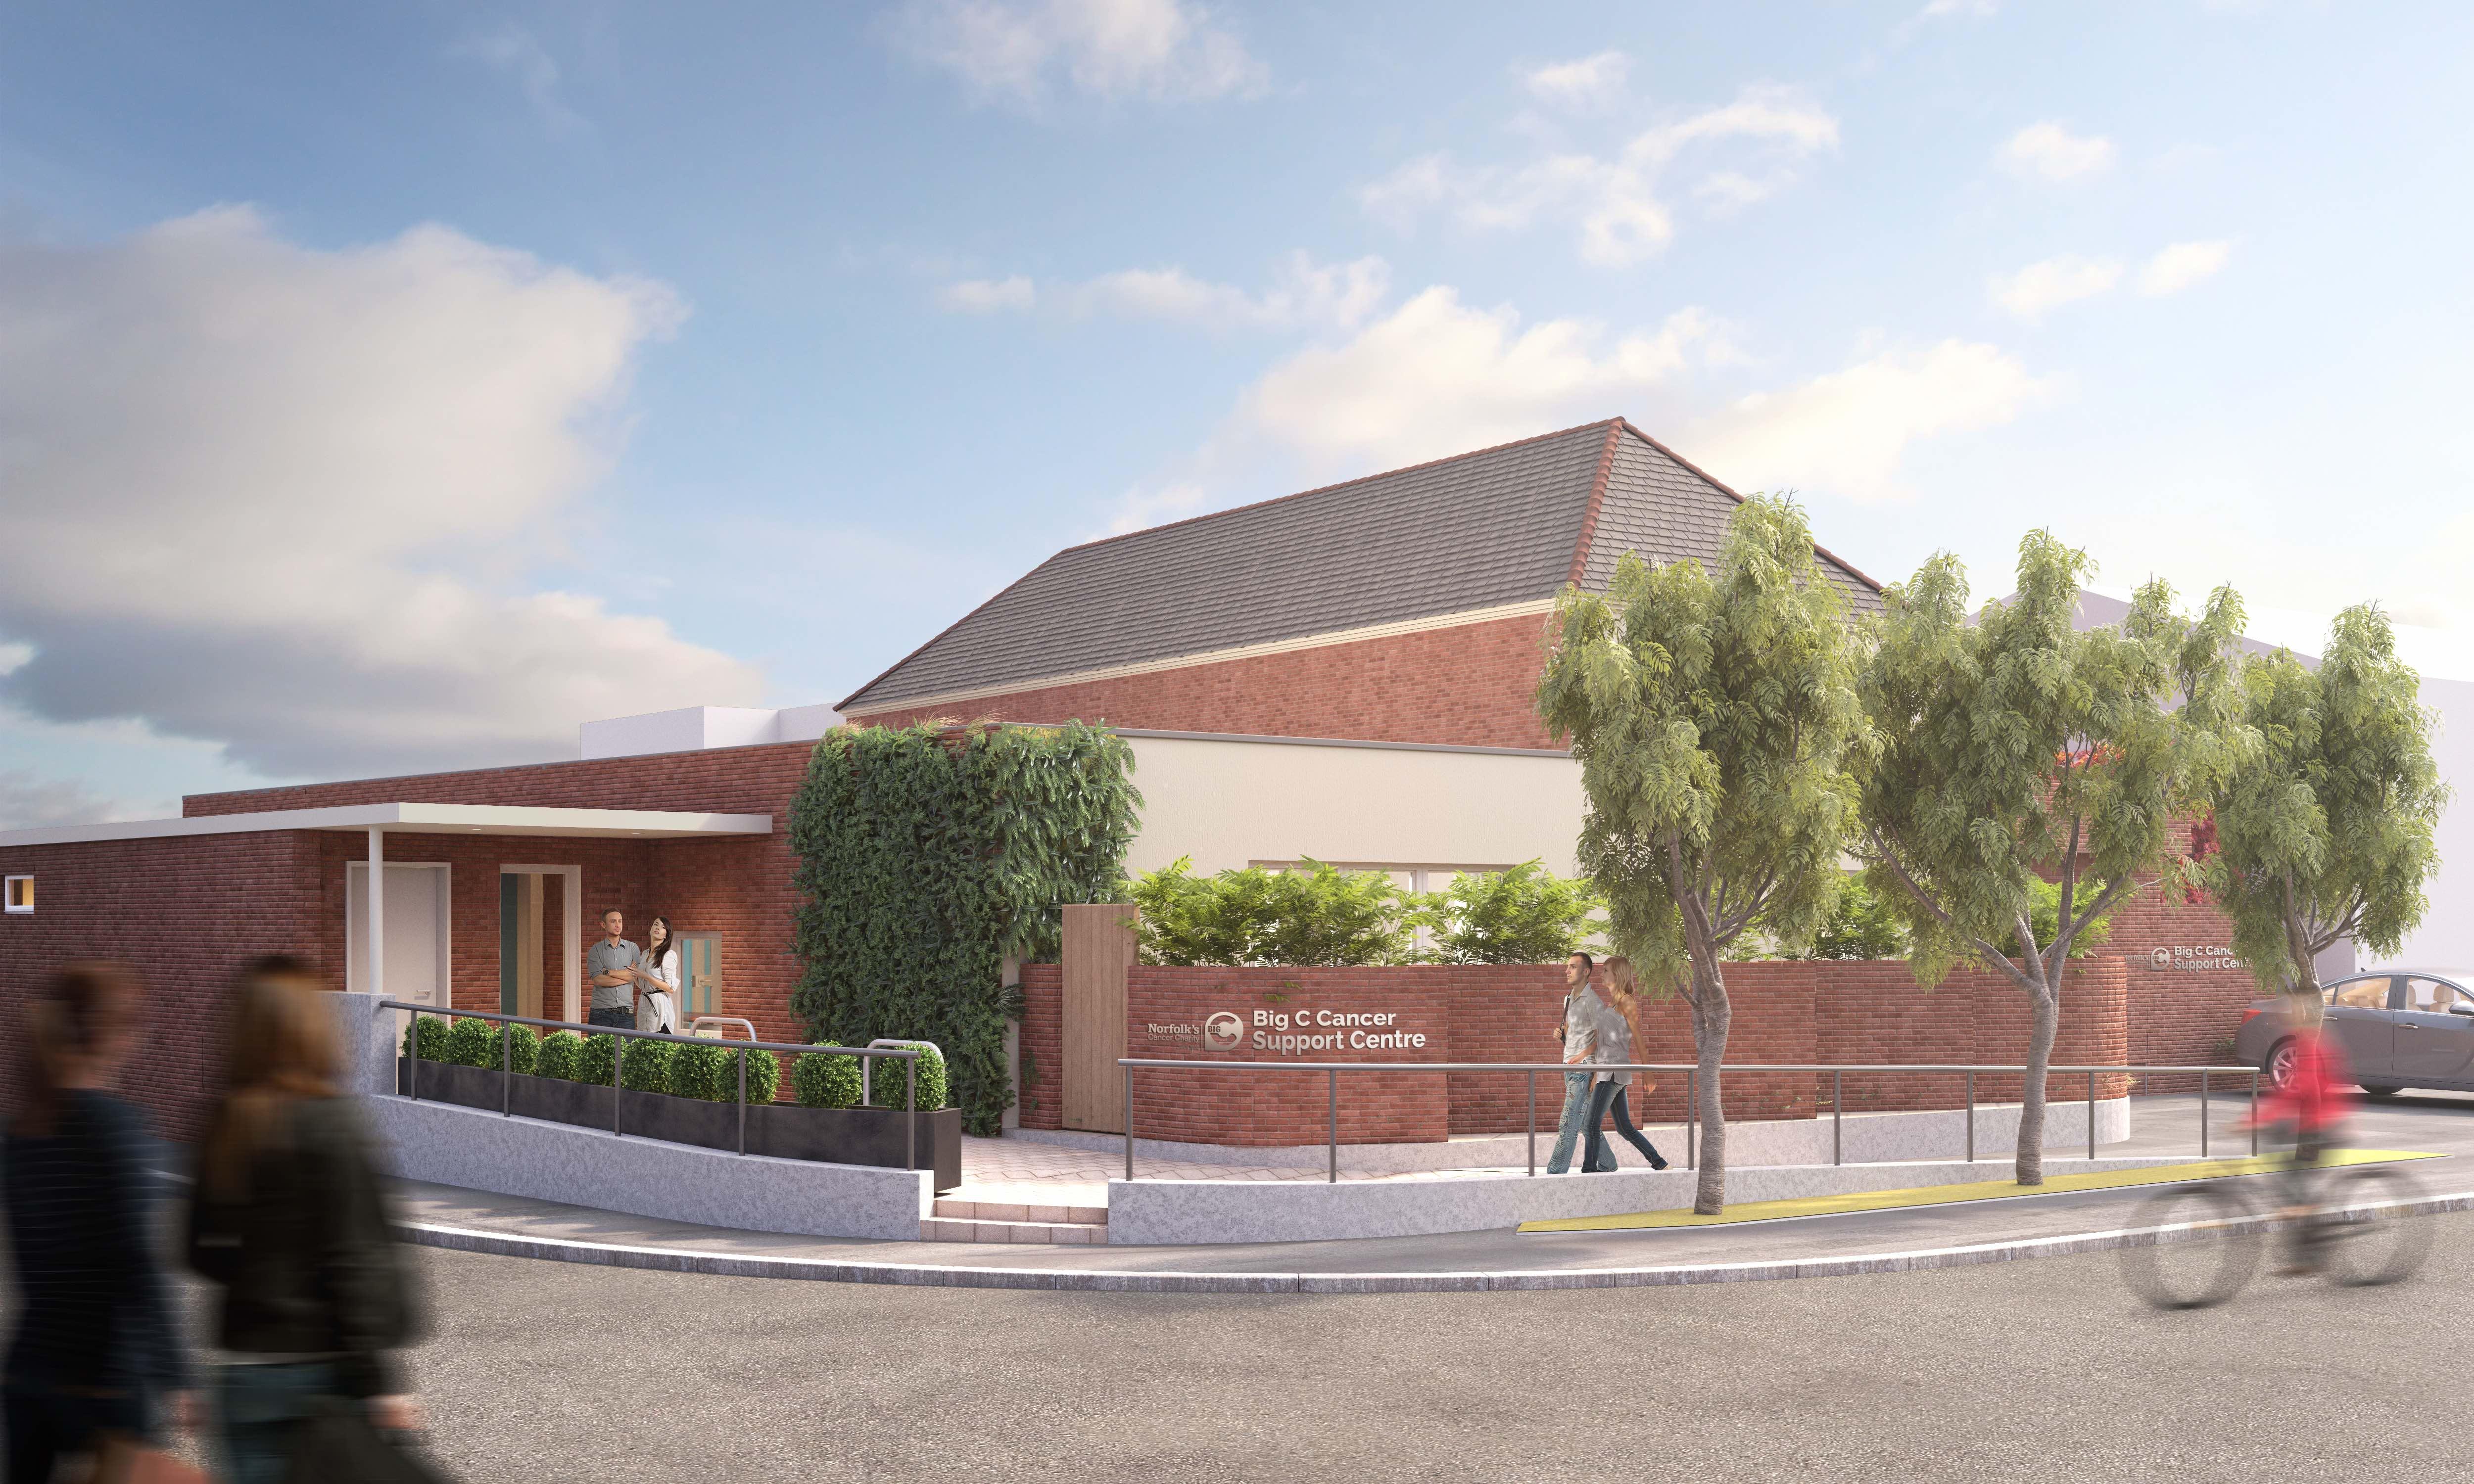 Big C New Centre on Dereham Road